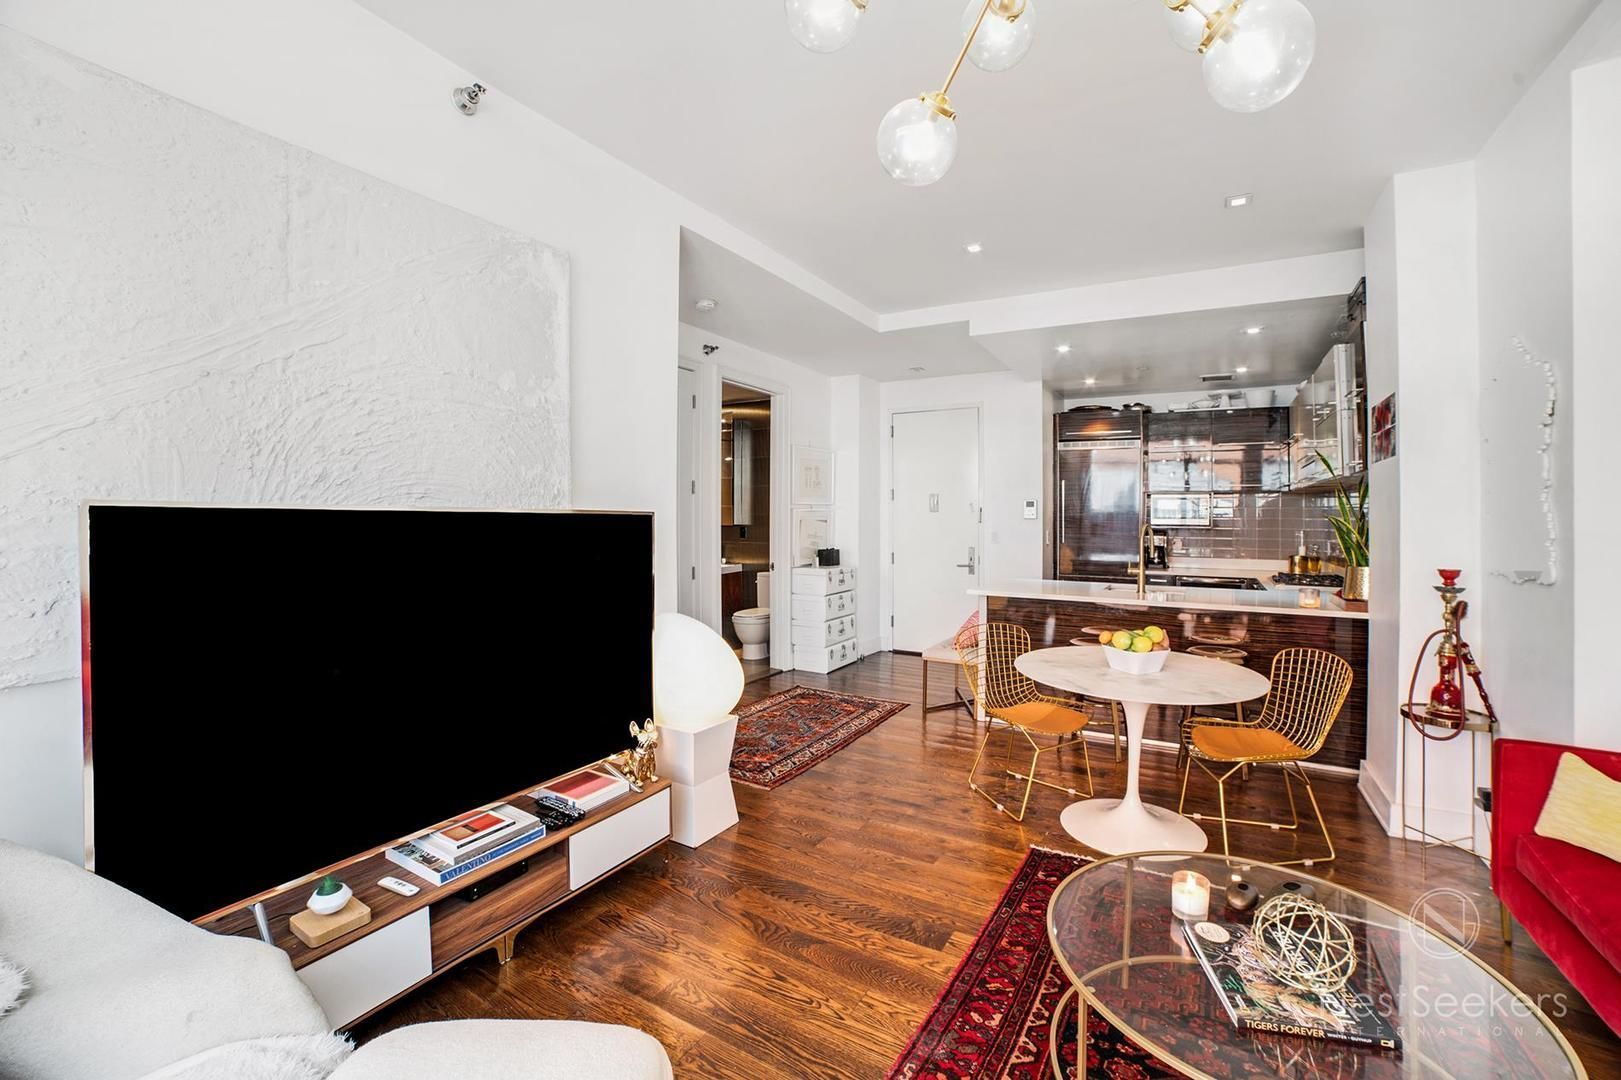 Apartment for sale at 26-26 Jackson Avenue, Apt 503